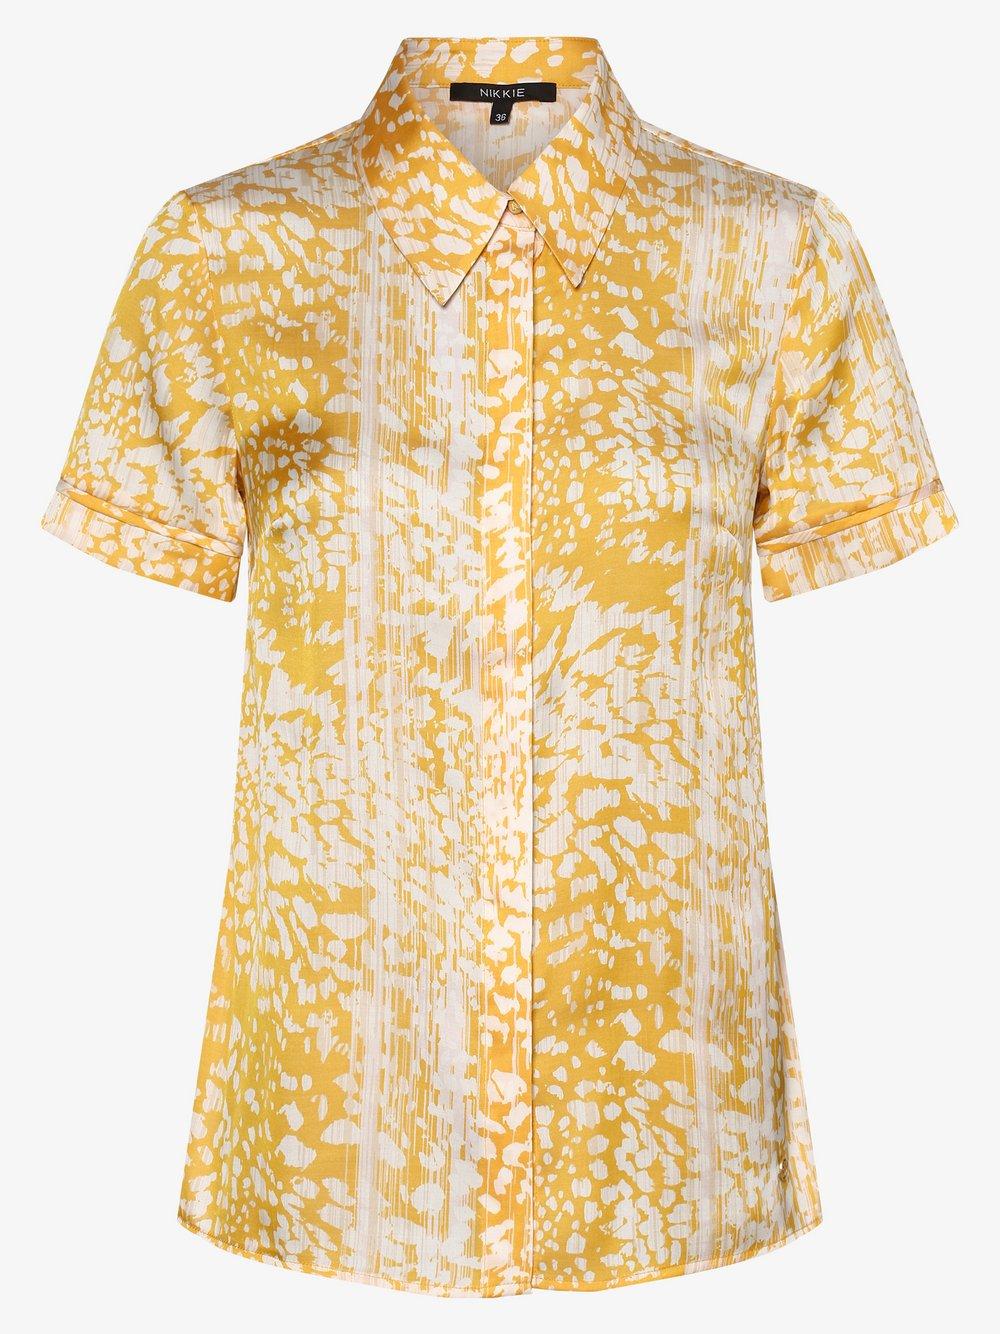 NIKKIE – Bluzka damska – Rana, żółty Van Graaf 465103-0001-00340